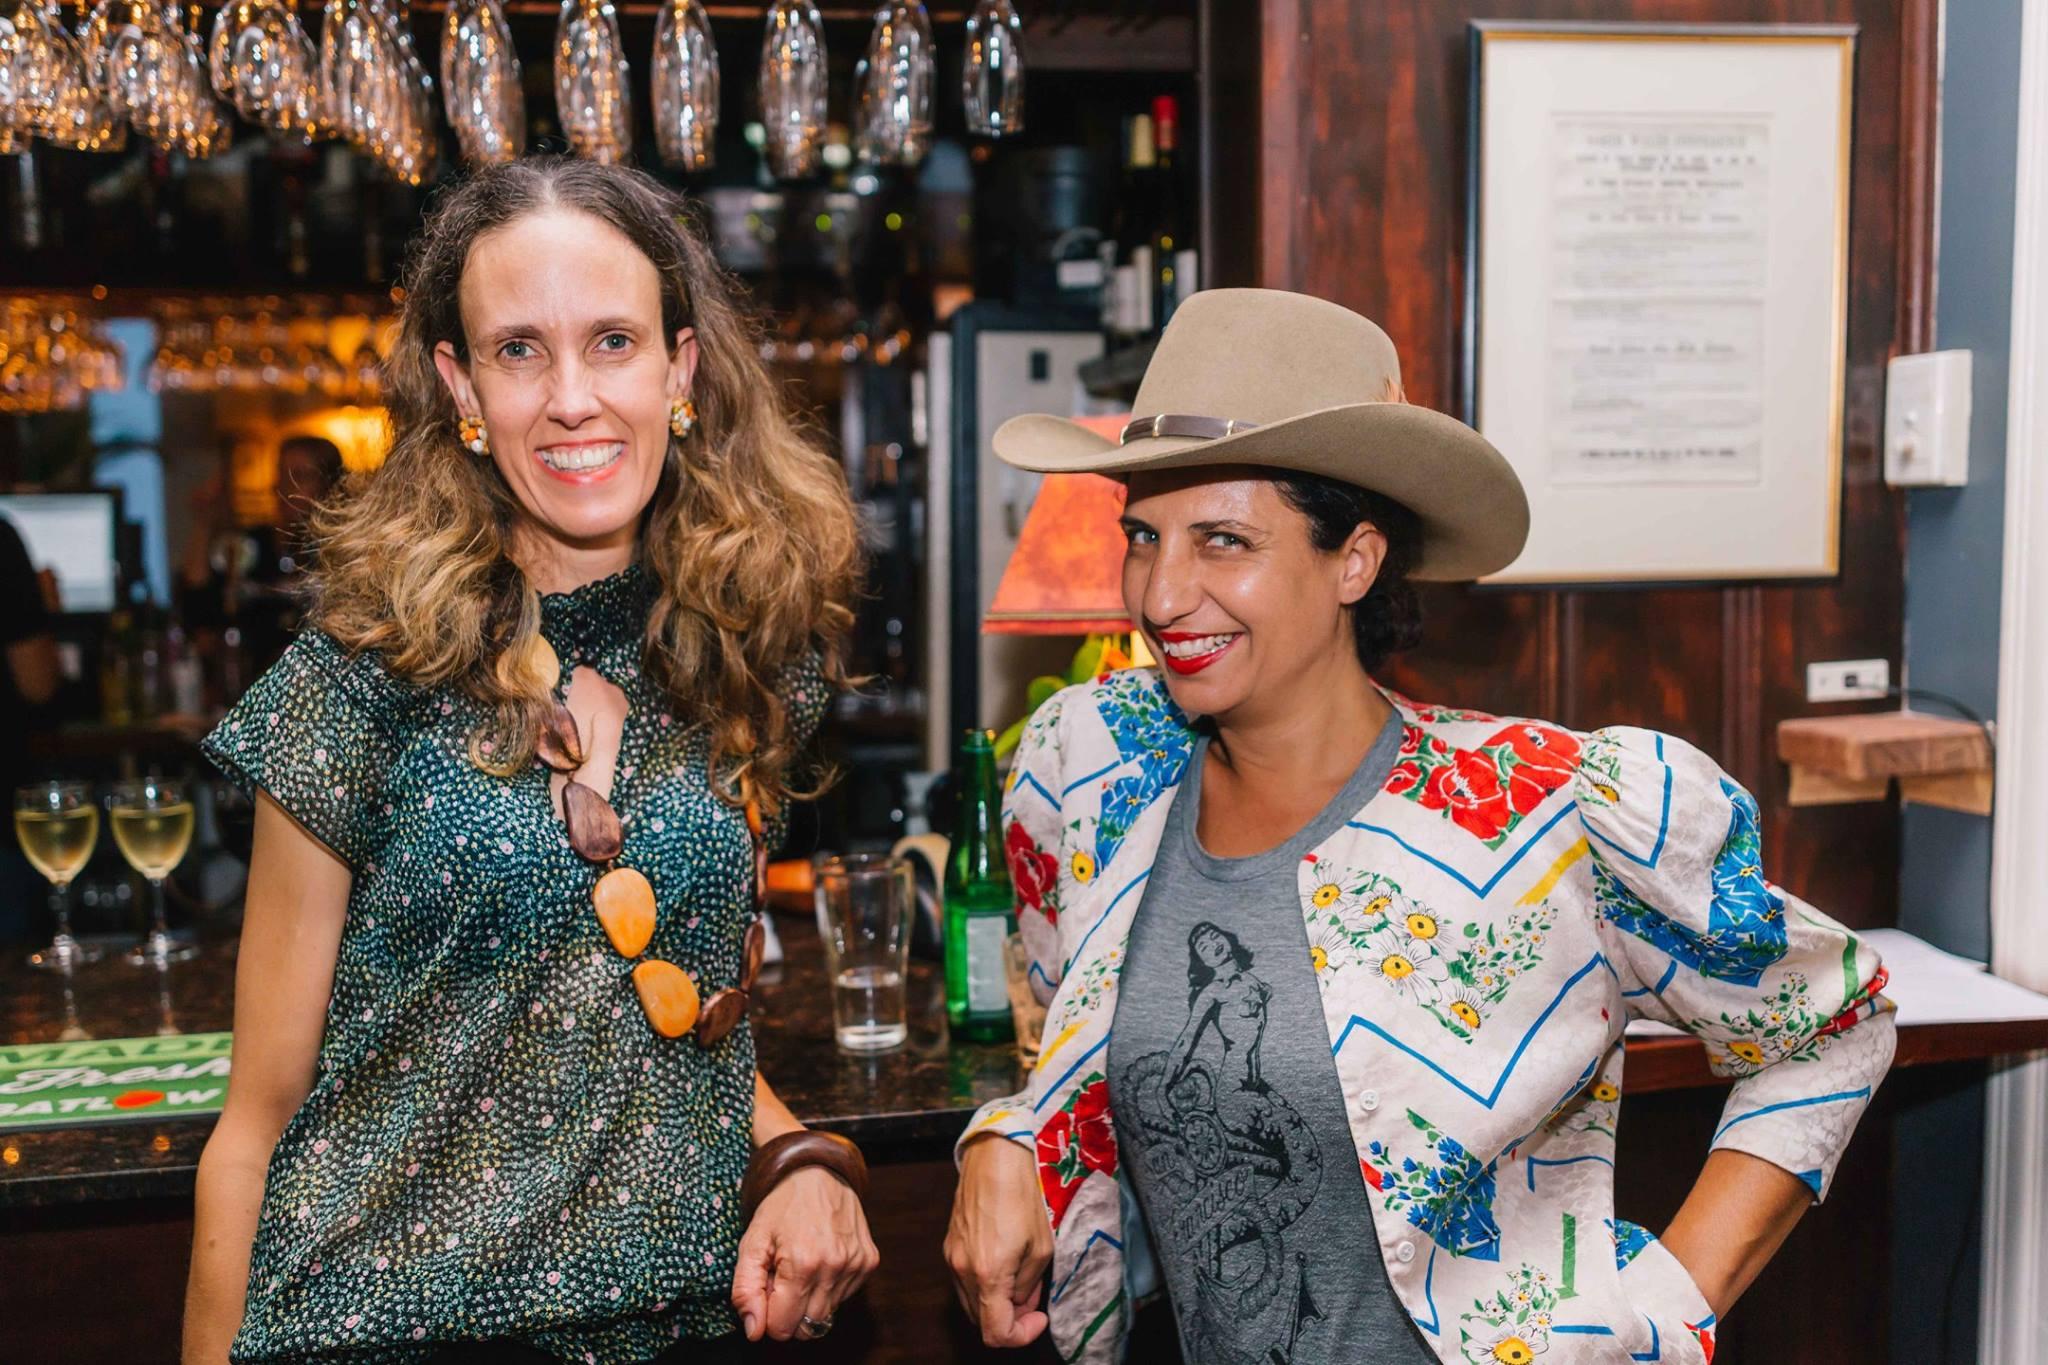 Two very special creative women, artist Yaeli Ohana and Cynthia Sciberras, editor of YOKE magazine at our Mama Creatives Expert Blogger Panel